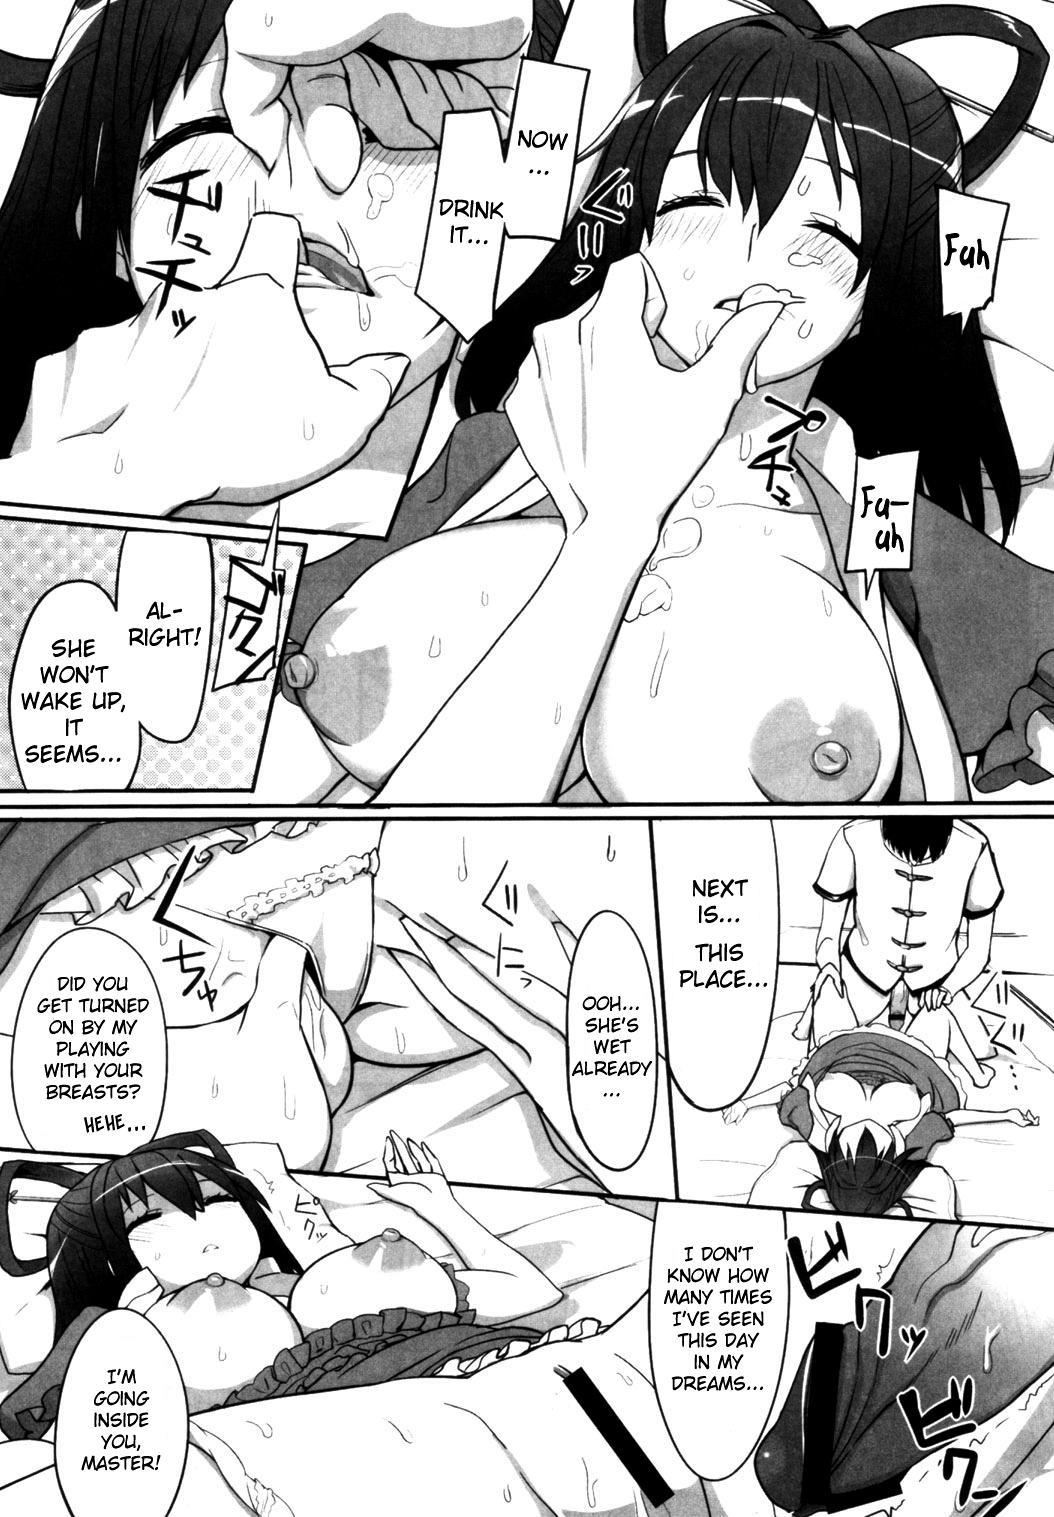 (Reitaisai 9) [various] Touhou Sleep Sex Anthology ch1-3, 6-8, 10, 14, 16, 19, 21 (Touhou Project) [English] {pesu} 87